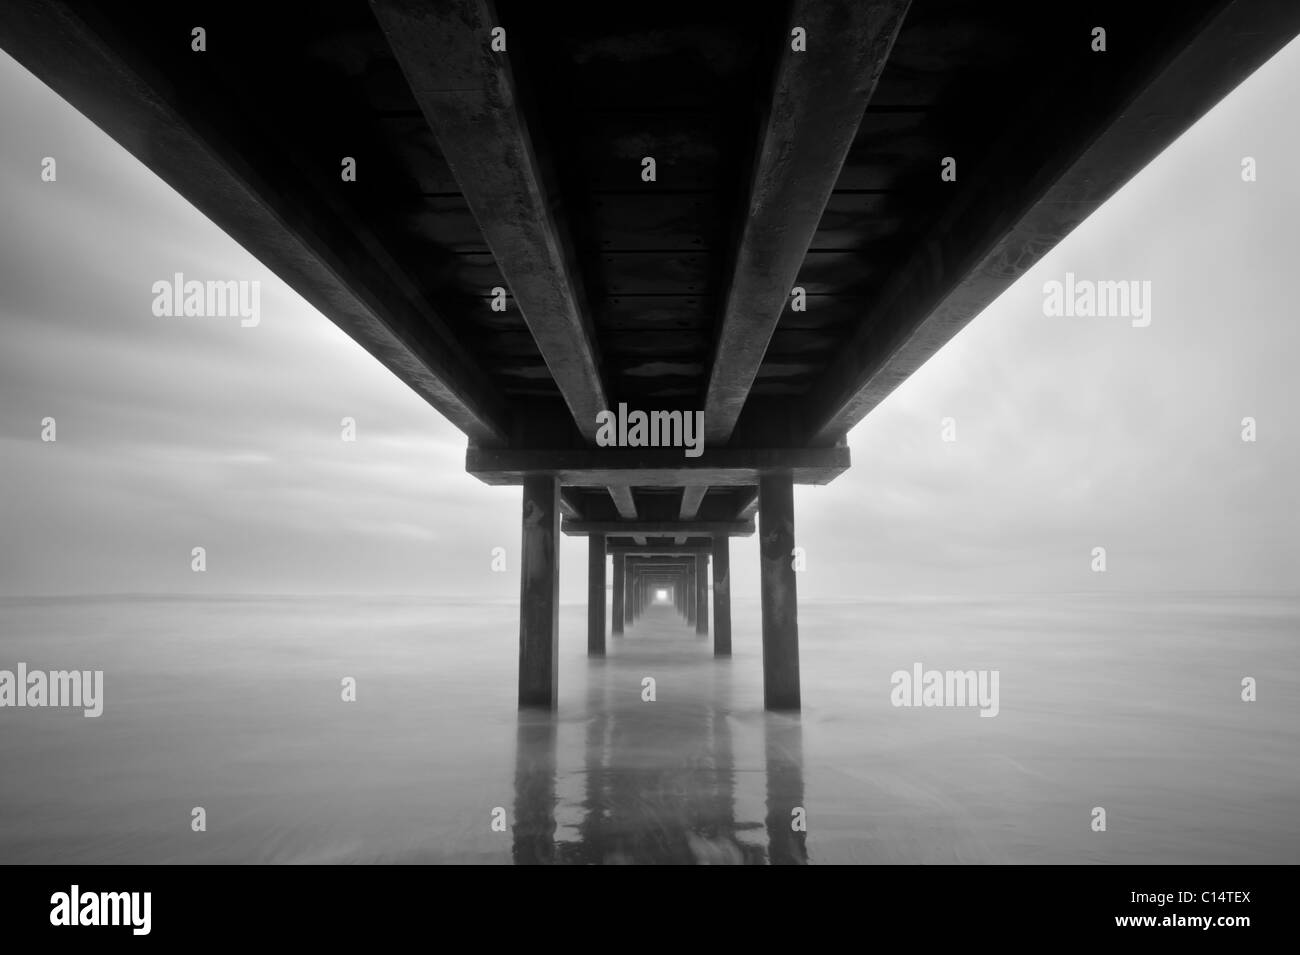 Foto unter einem Pier in Port Aransas, Texas. Stockbild